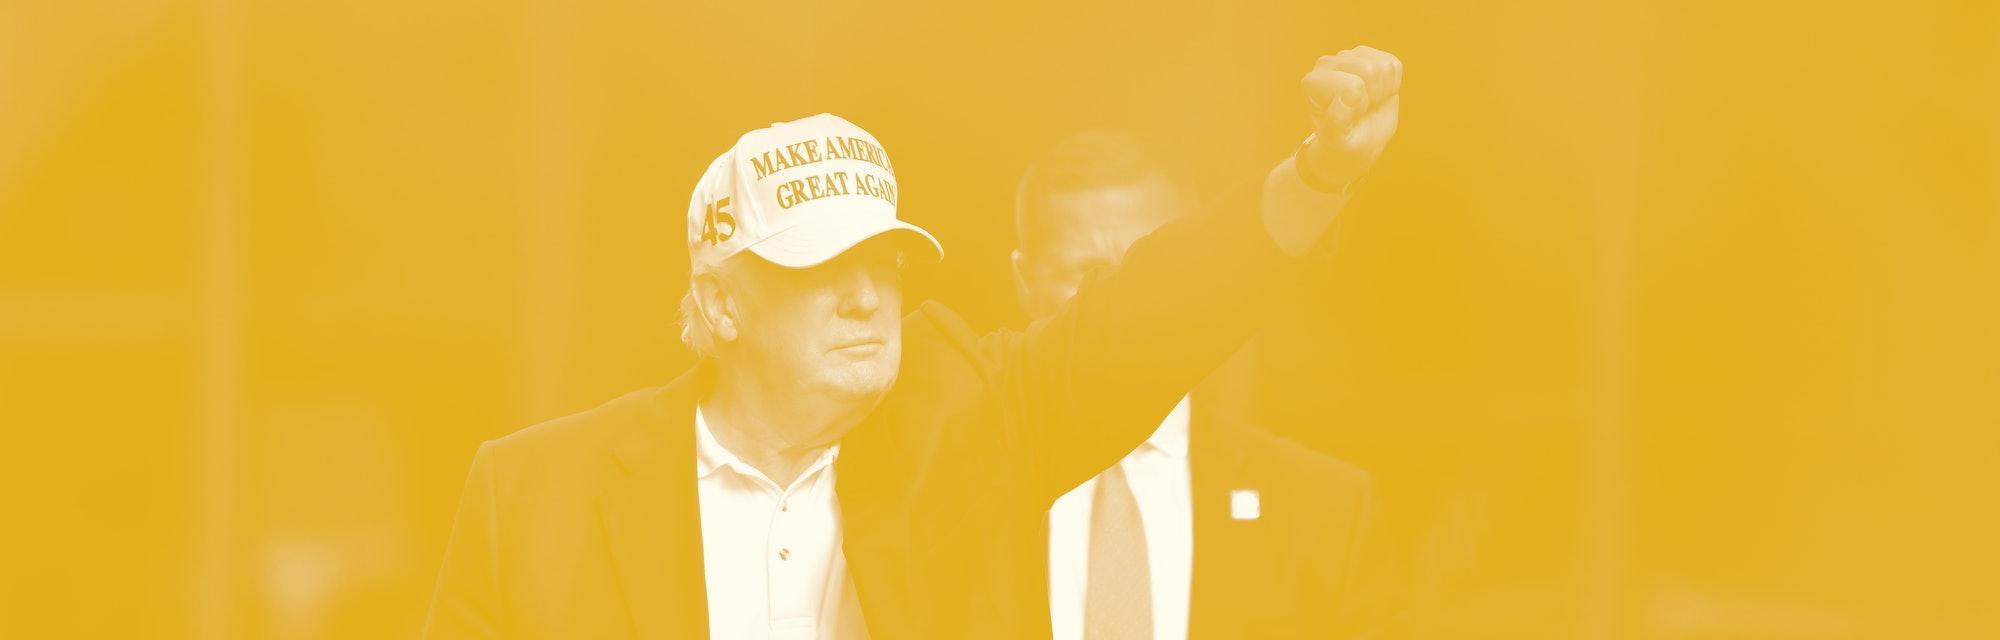 NEW YORK, NEW YORK - JULY 04:  Former U.S. President Donald Trump arrives at Trump Tower in Manhatta...